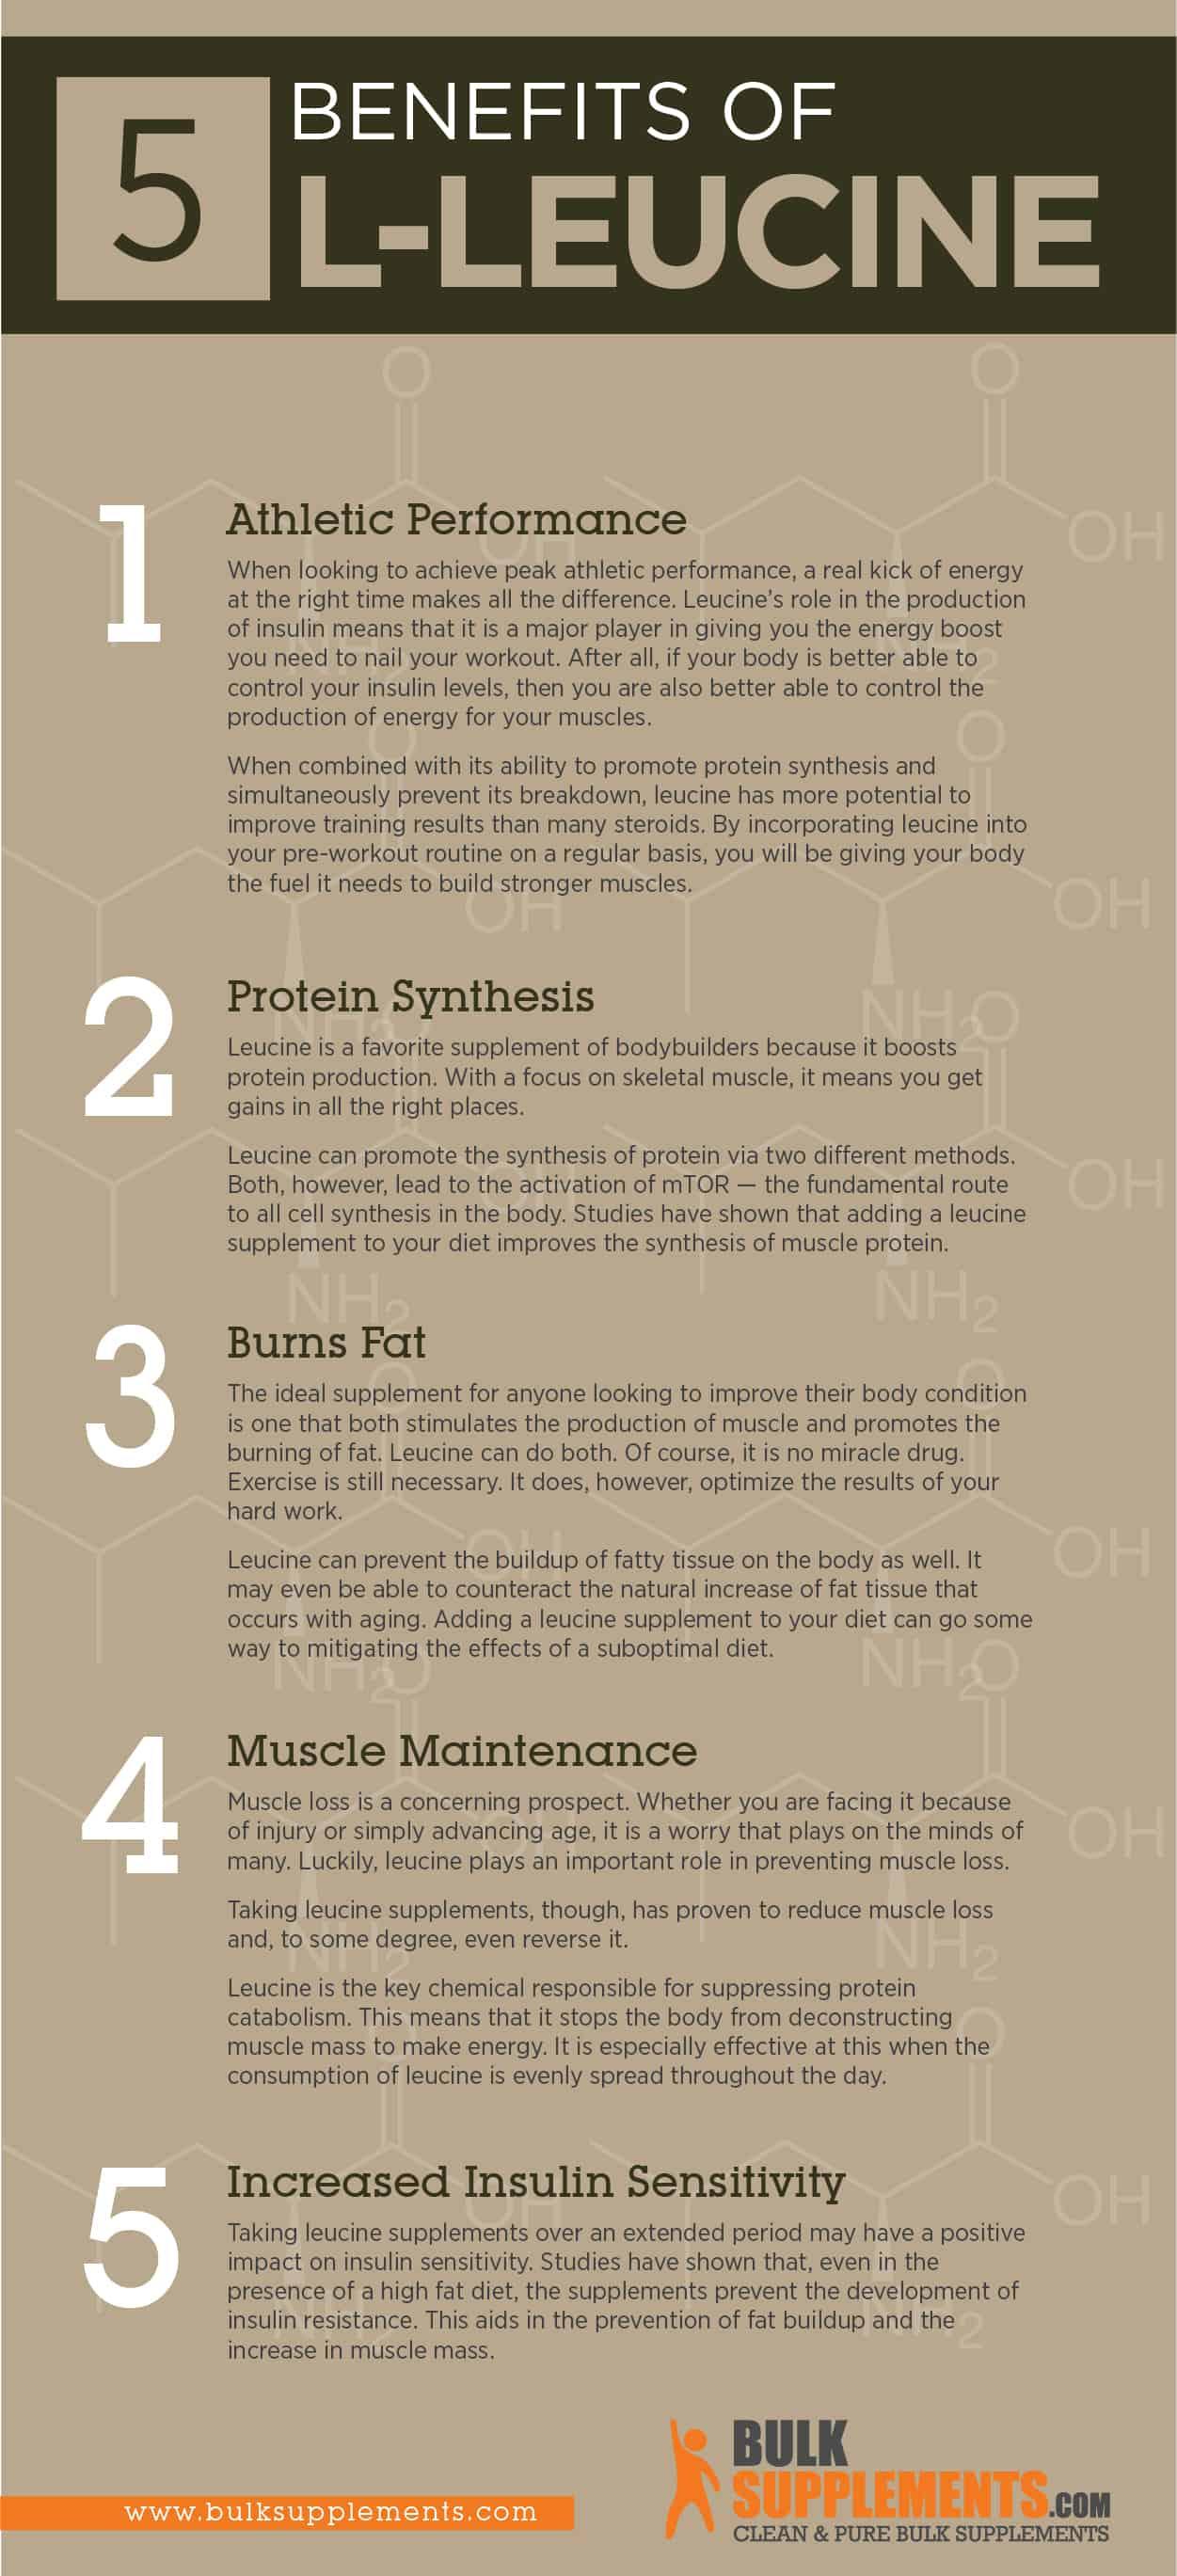 L-Leucine benefits infographic